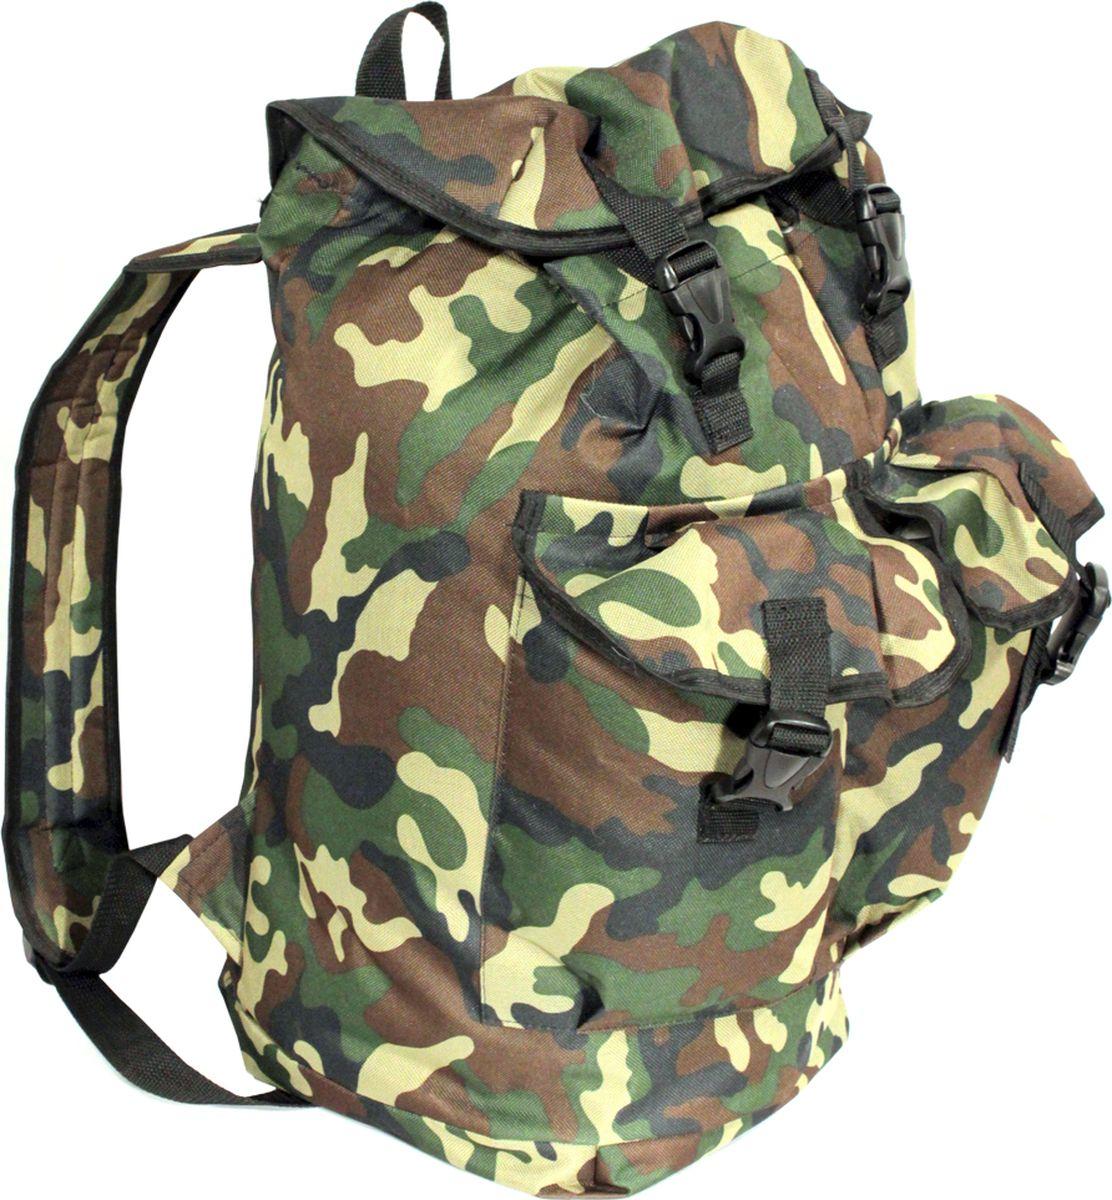 Рюкзак туристический Каприкорн Таежный Люкс, 50 л ostin рюкзак с двумя карманами